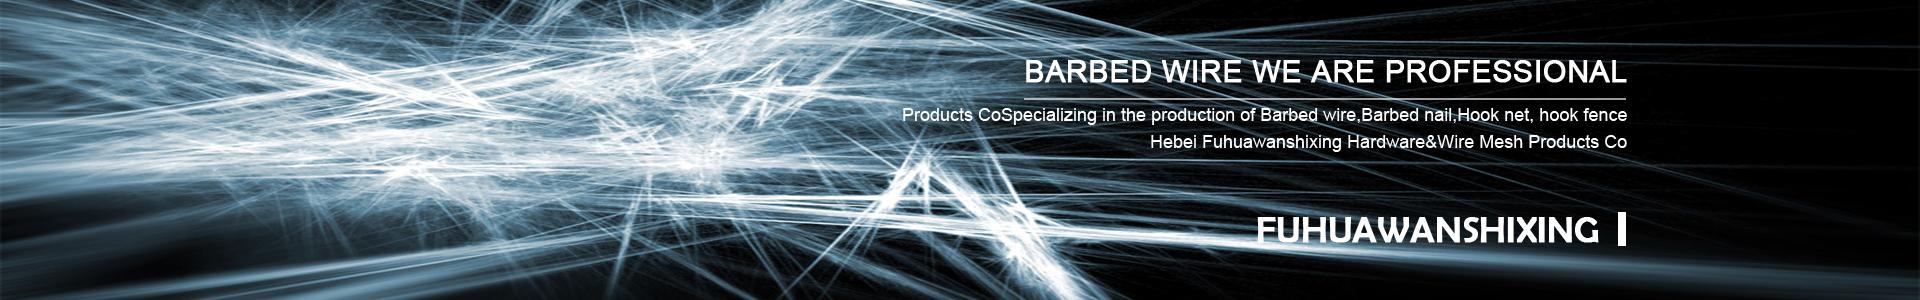 Hebei Fuhuawanshixing Hardware&Wire Mesh Products CoSpecializing in ...